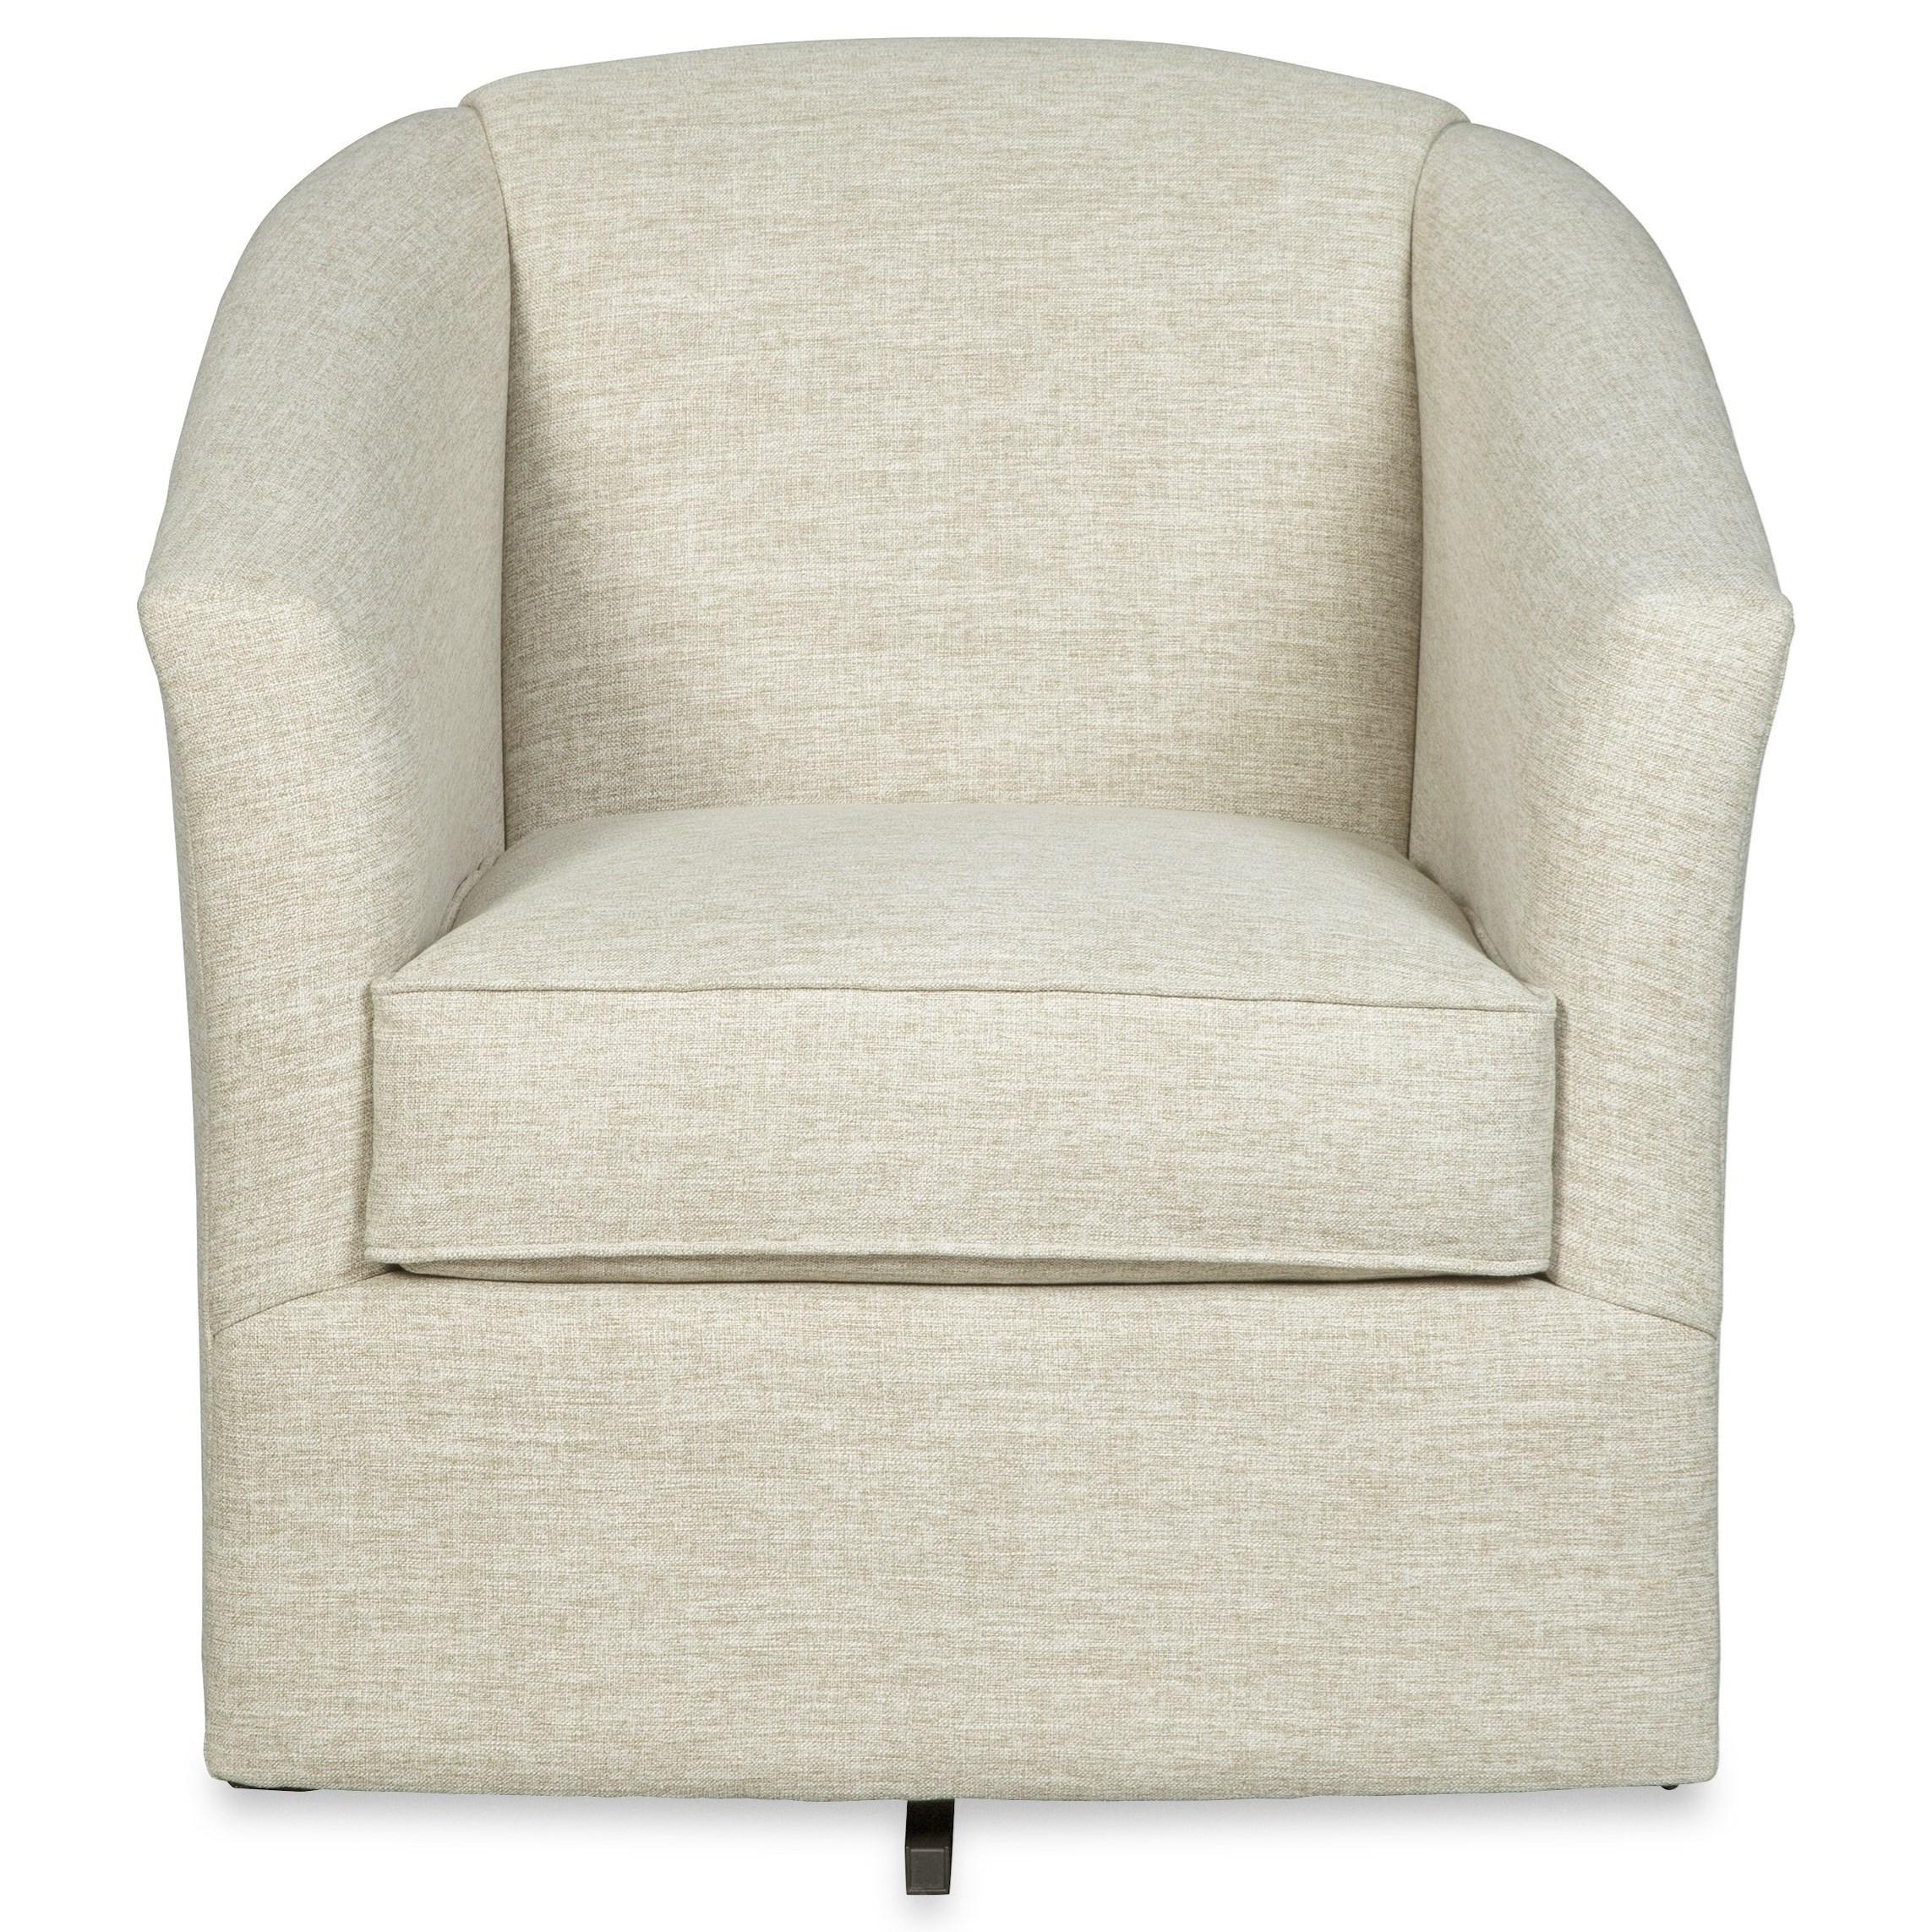 Contemporary Swivel Chair